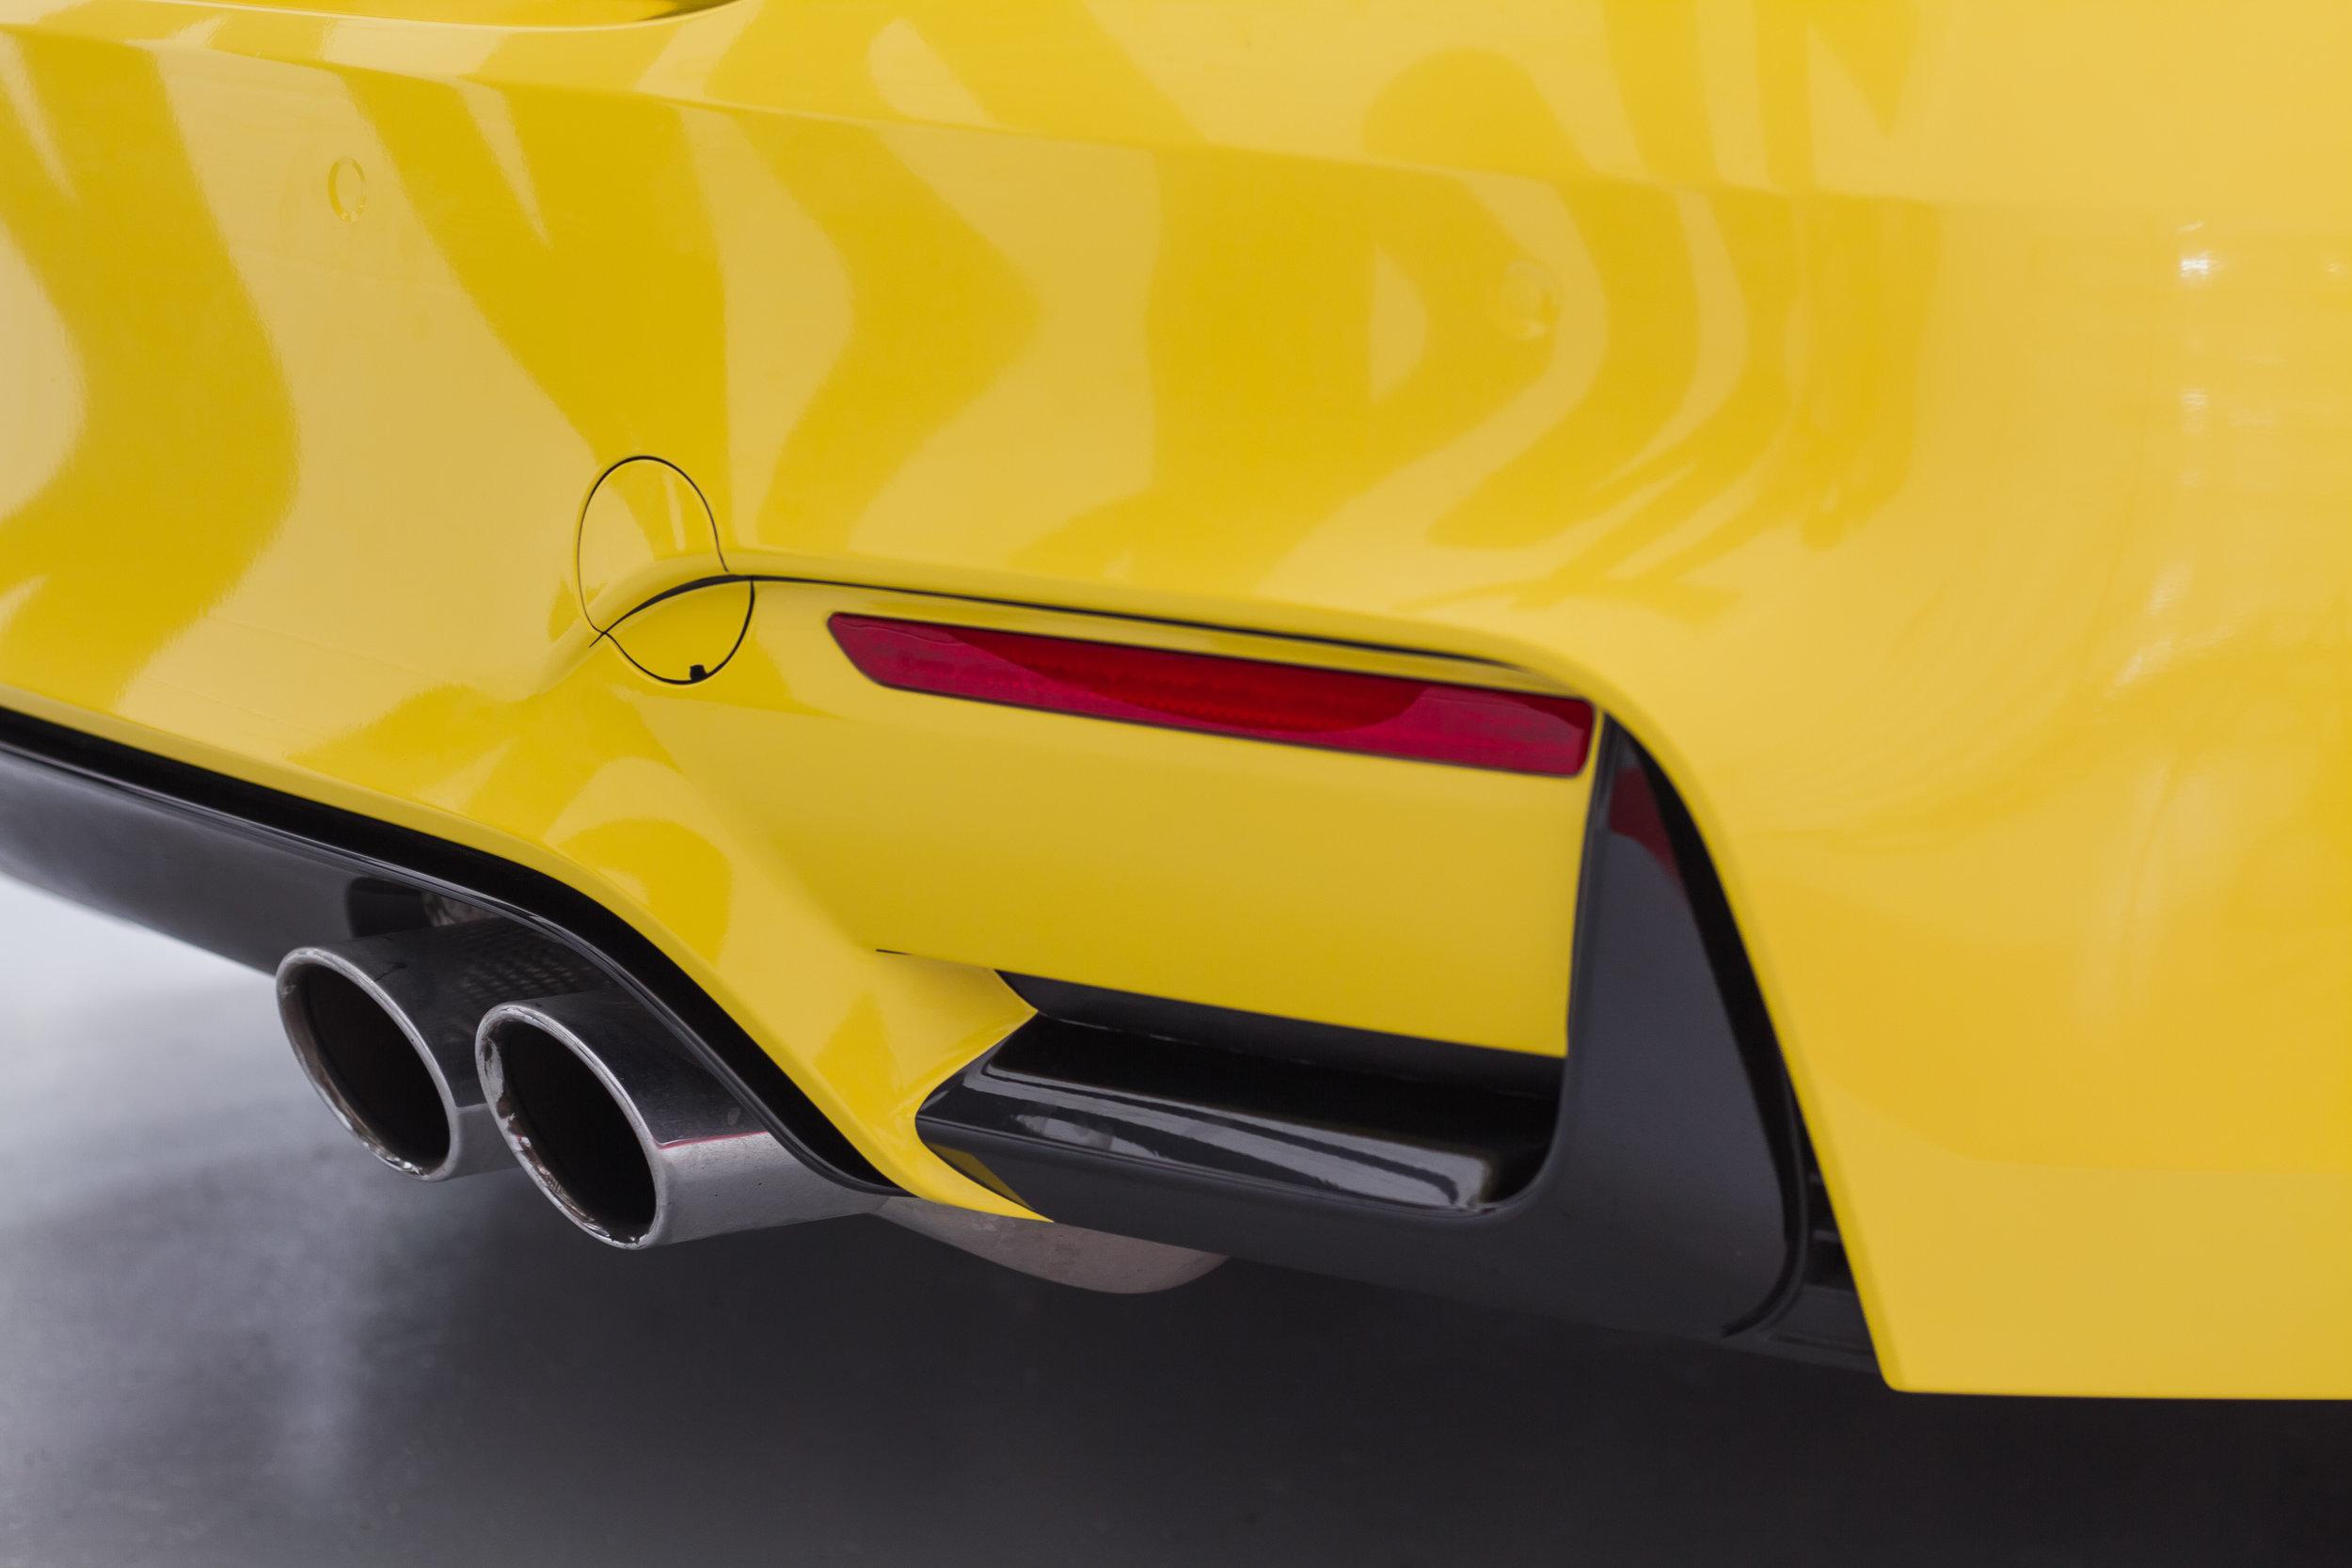 BMW M4 back bumper grill